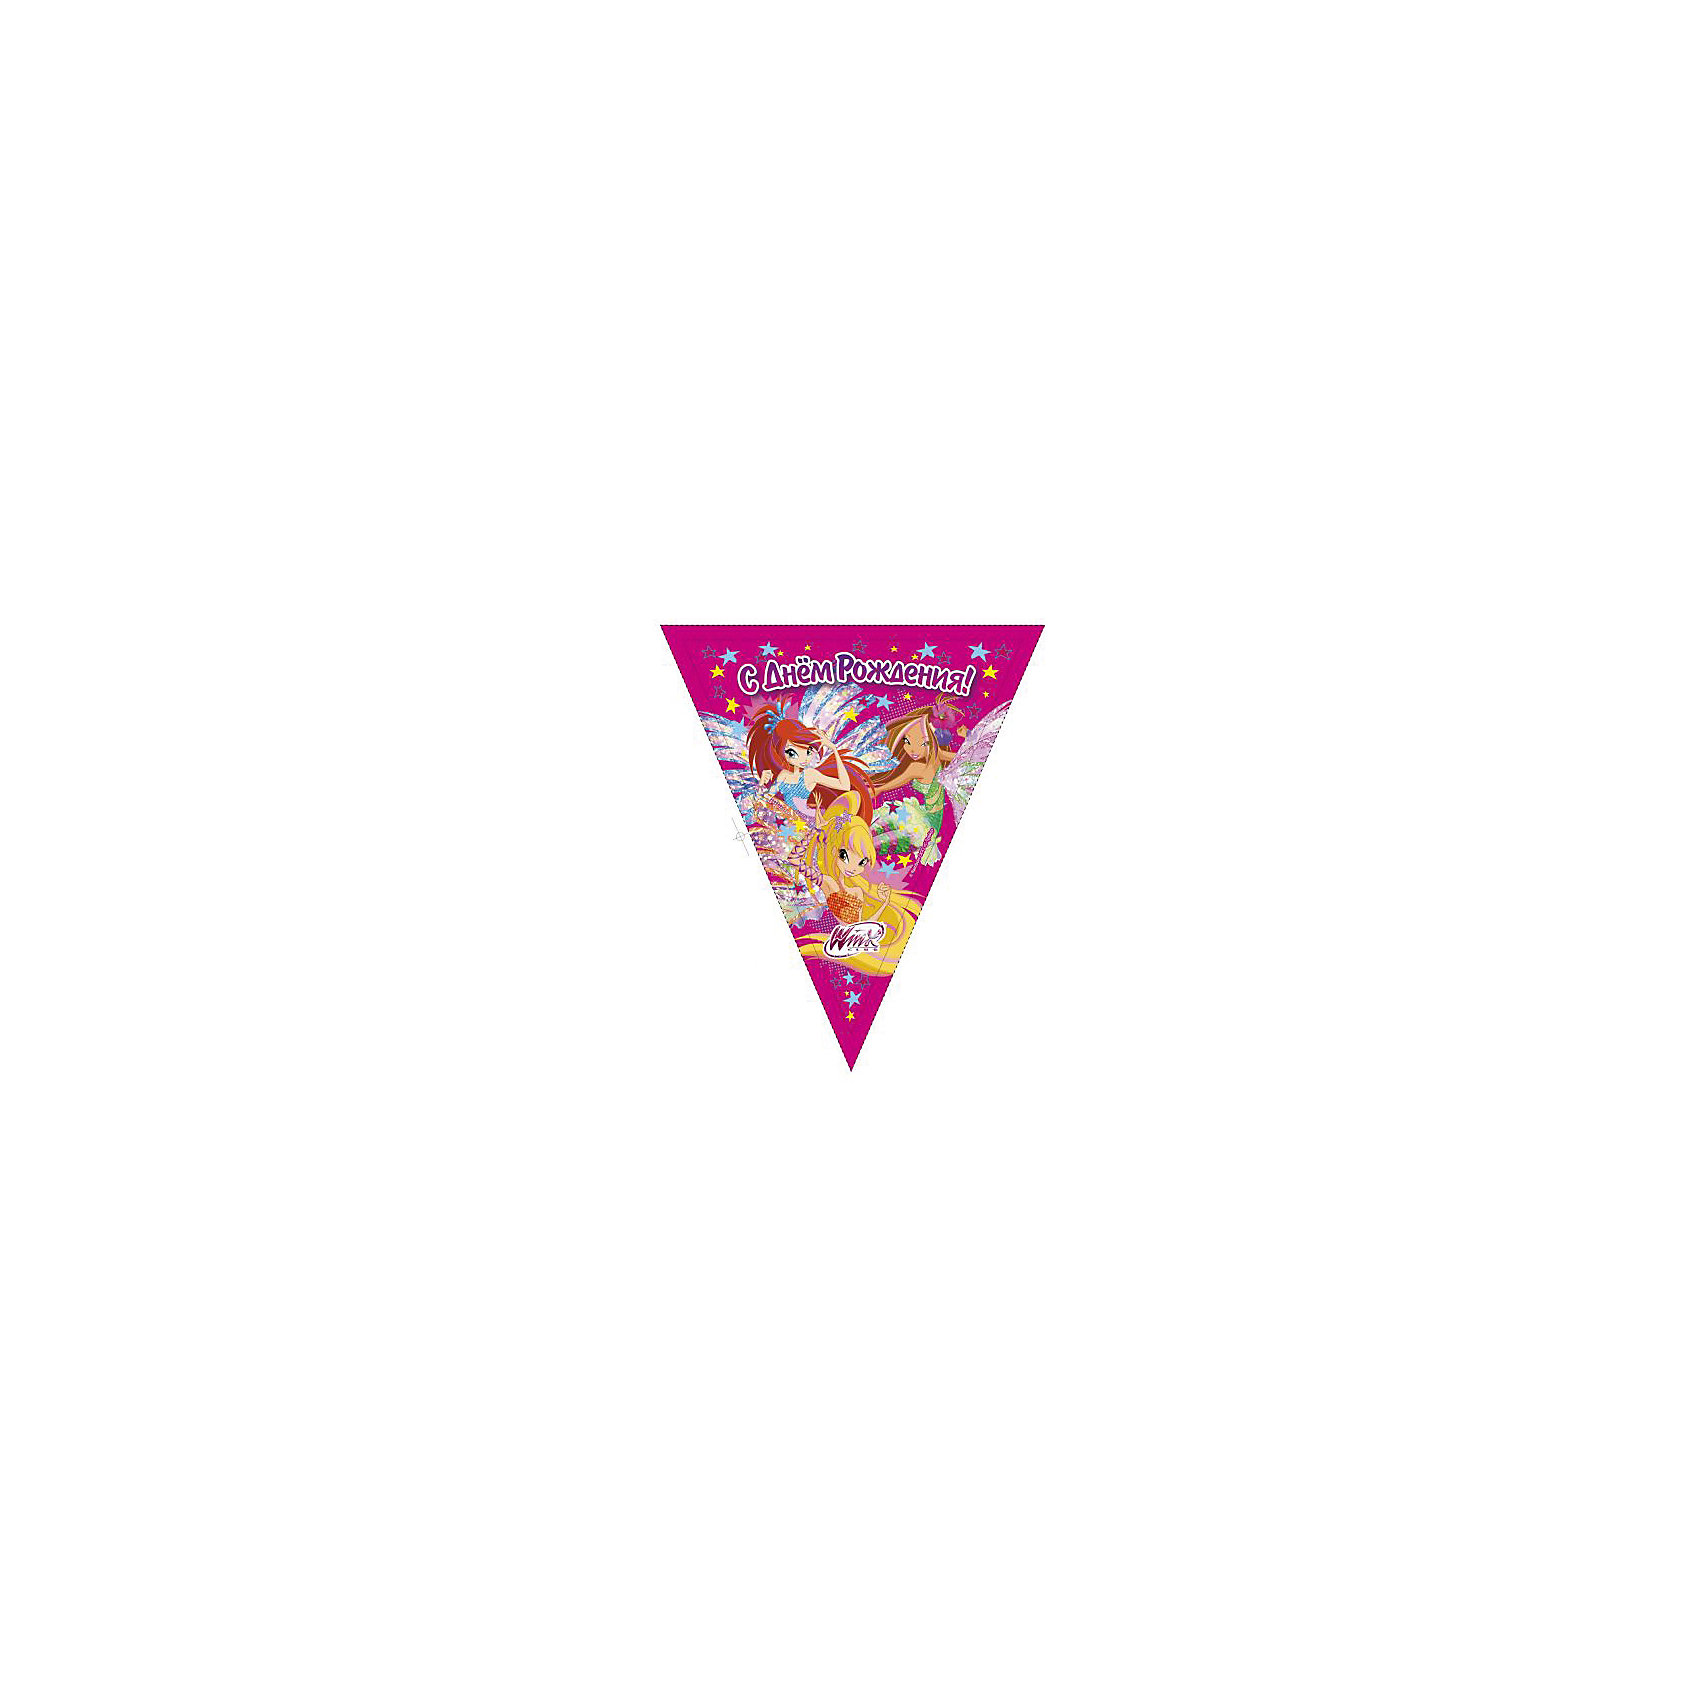 Гирлянда-флаги Winx ClubГирлянда-флаги Веселый праздник Winx 300 см.<br><br>Ширина мм: 10<br>Глубина мм: 330<br>Высота мм: 240<br>Вес г: 20<br>Возраст от месяцев: 12<br>Возраст до месяцев: 72<br>Пол: Женский<br>Возраст: Детский<br>SKU: 5196932